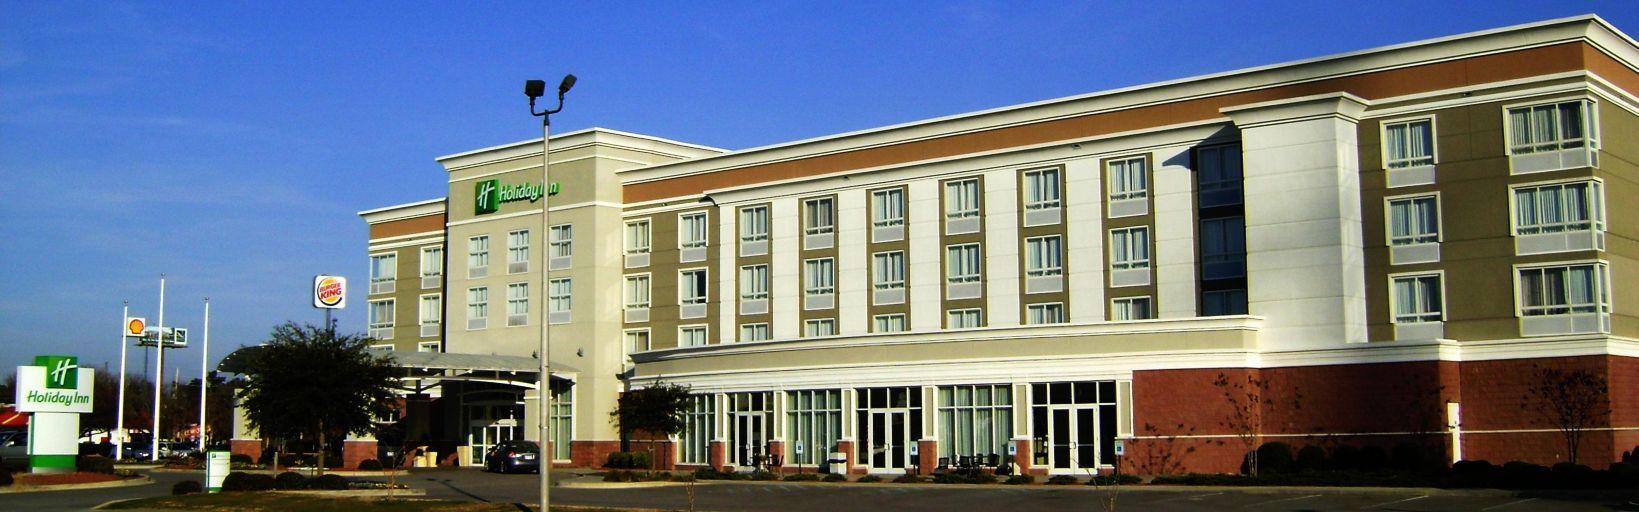 Welcome To Holiday Inn Santee South Carolina